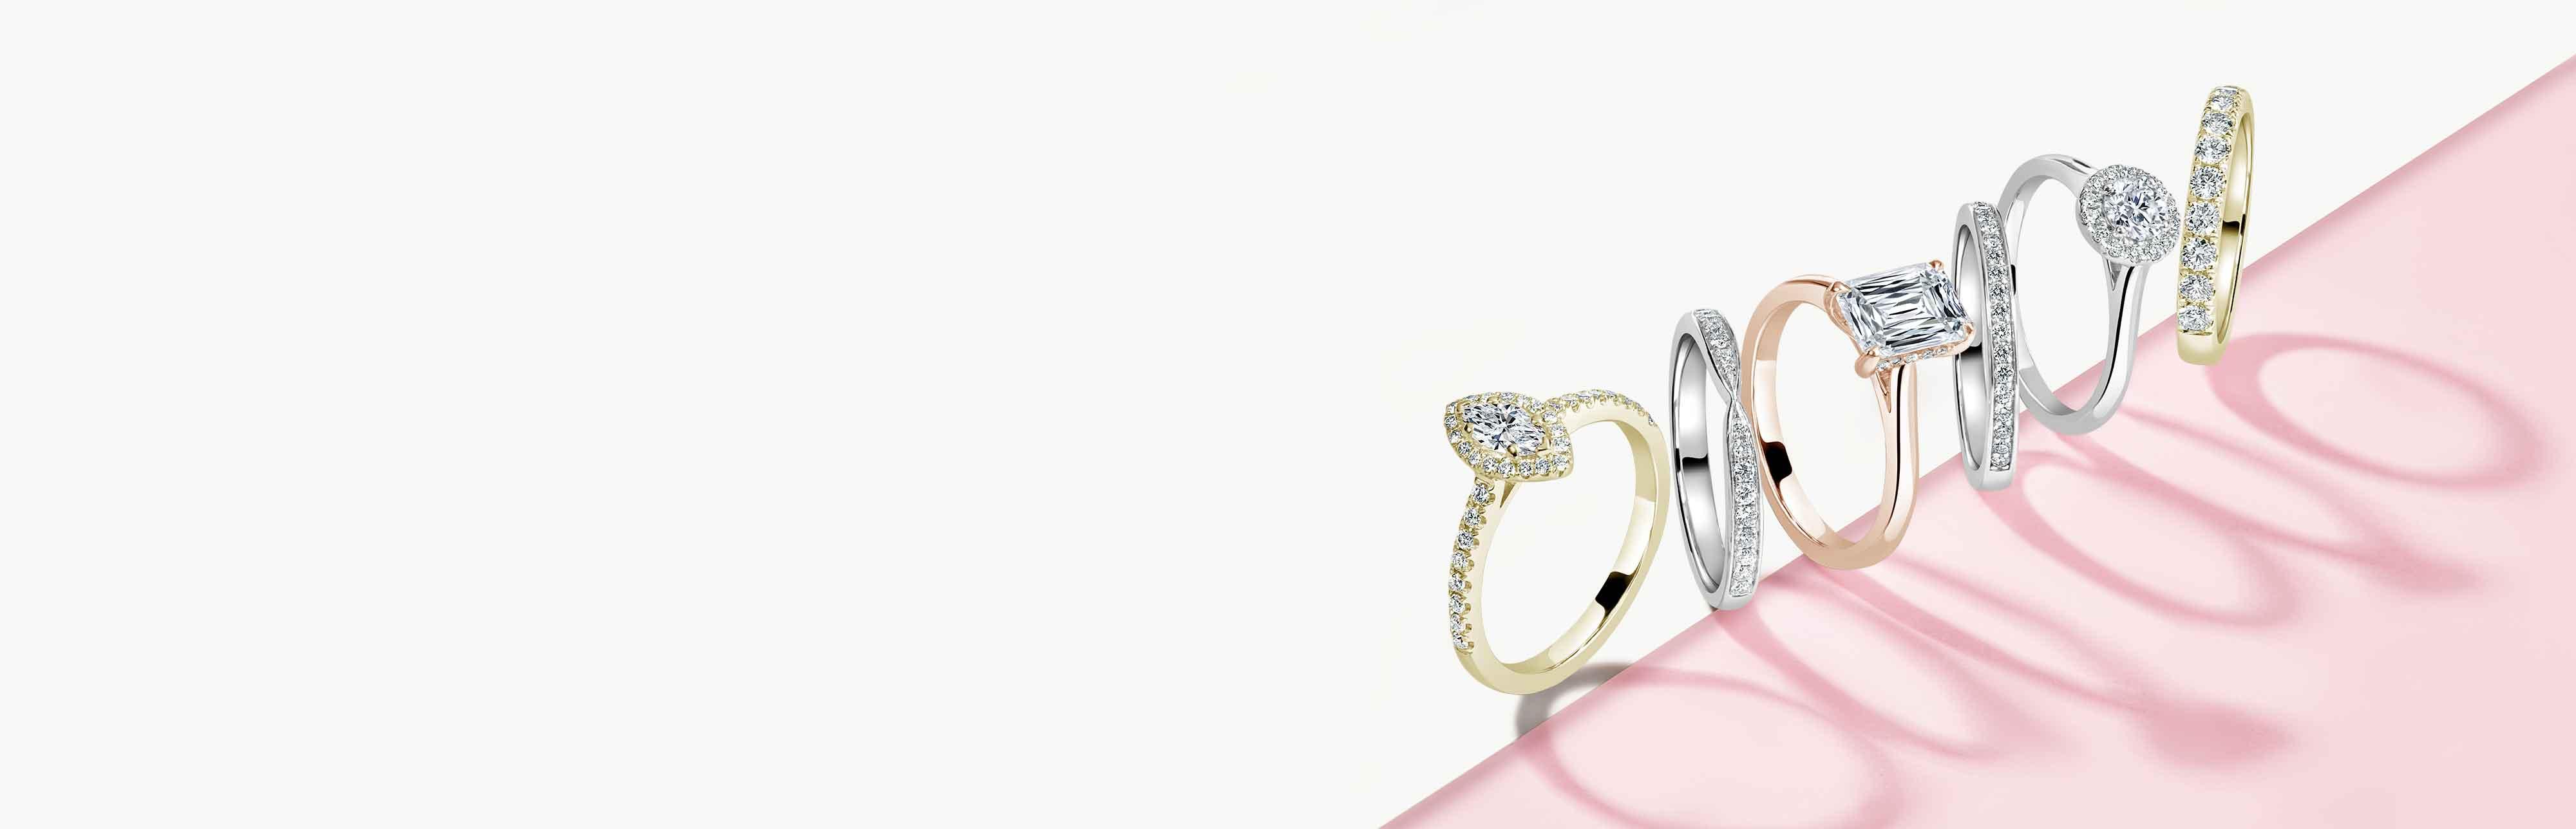 Round Brilliant Shoulder Set Engagement Rings - Steven Stone